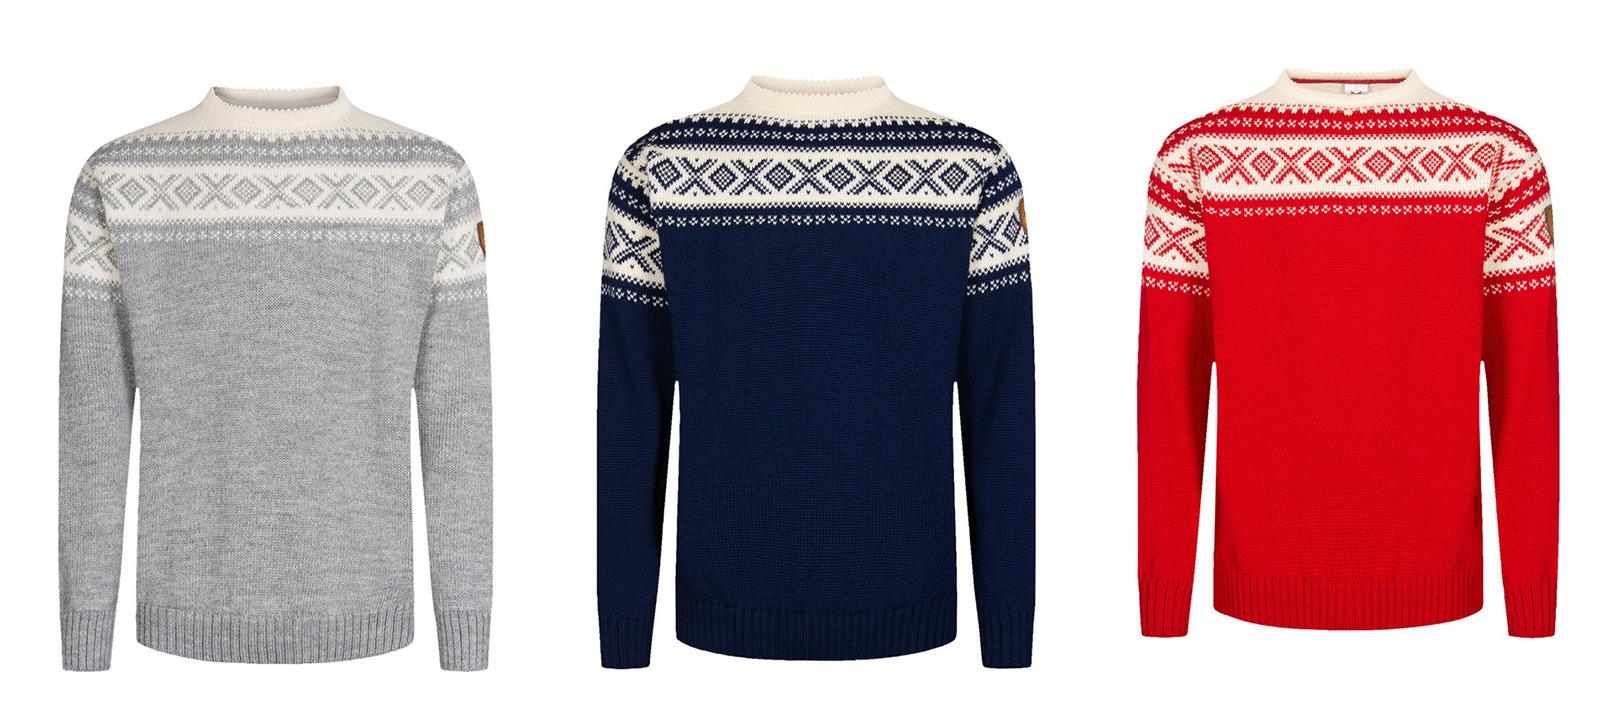 Dale of Norway Sweater – Cortina 1956 Sweater